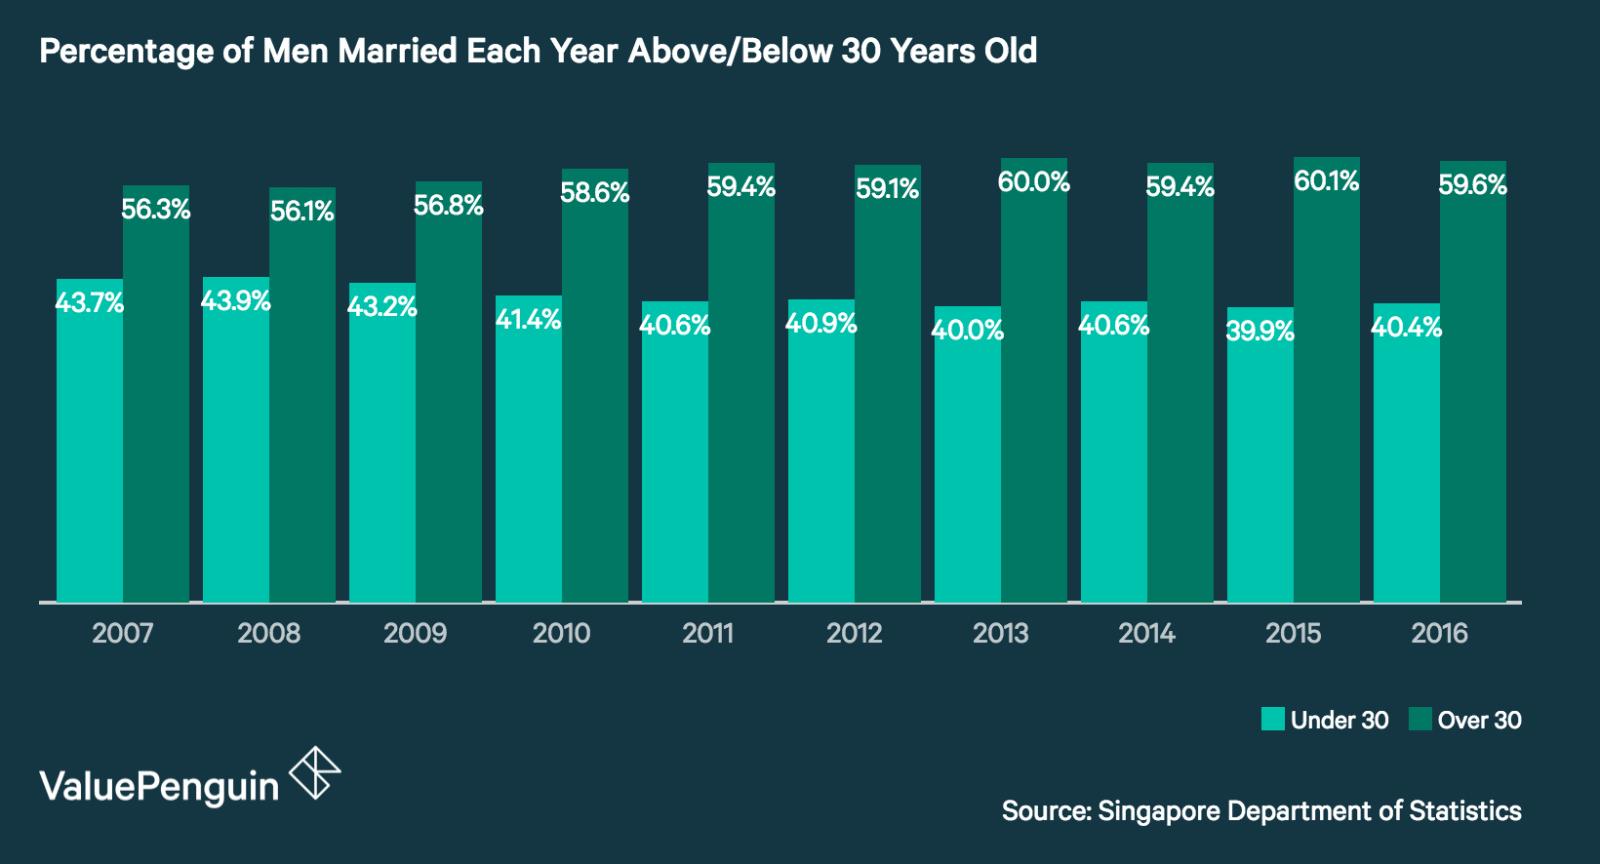 Percentage of Men Married Each Year Above/Below 30 Years Old